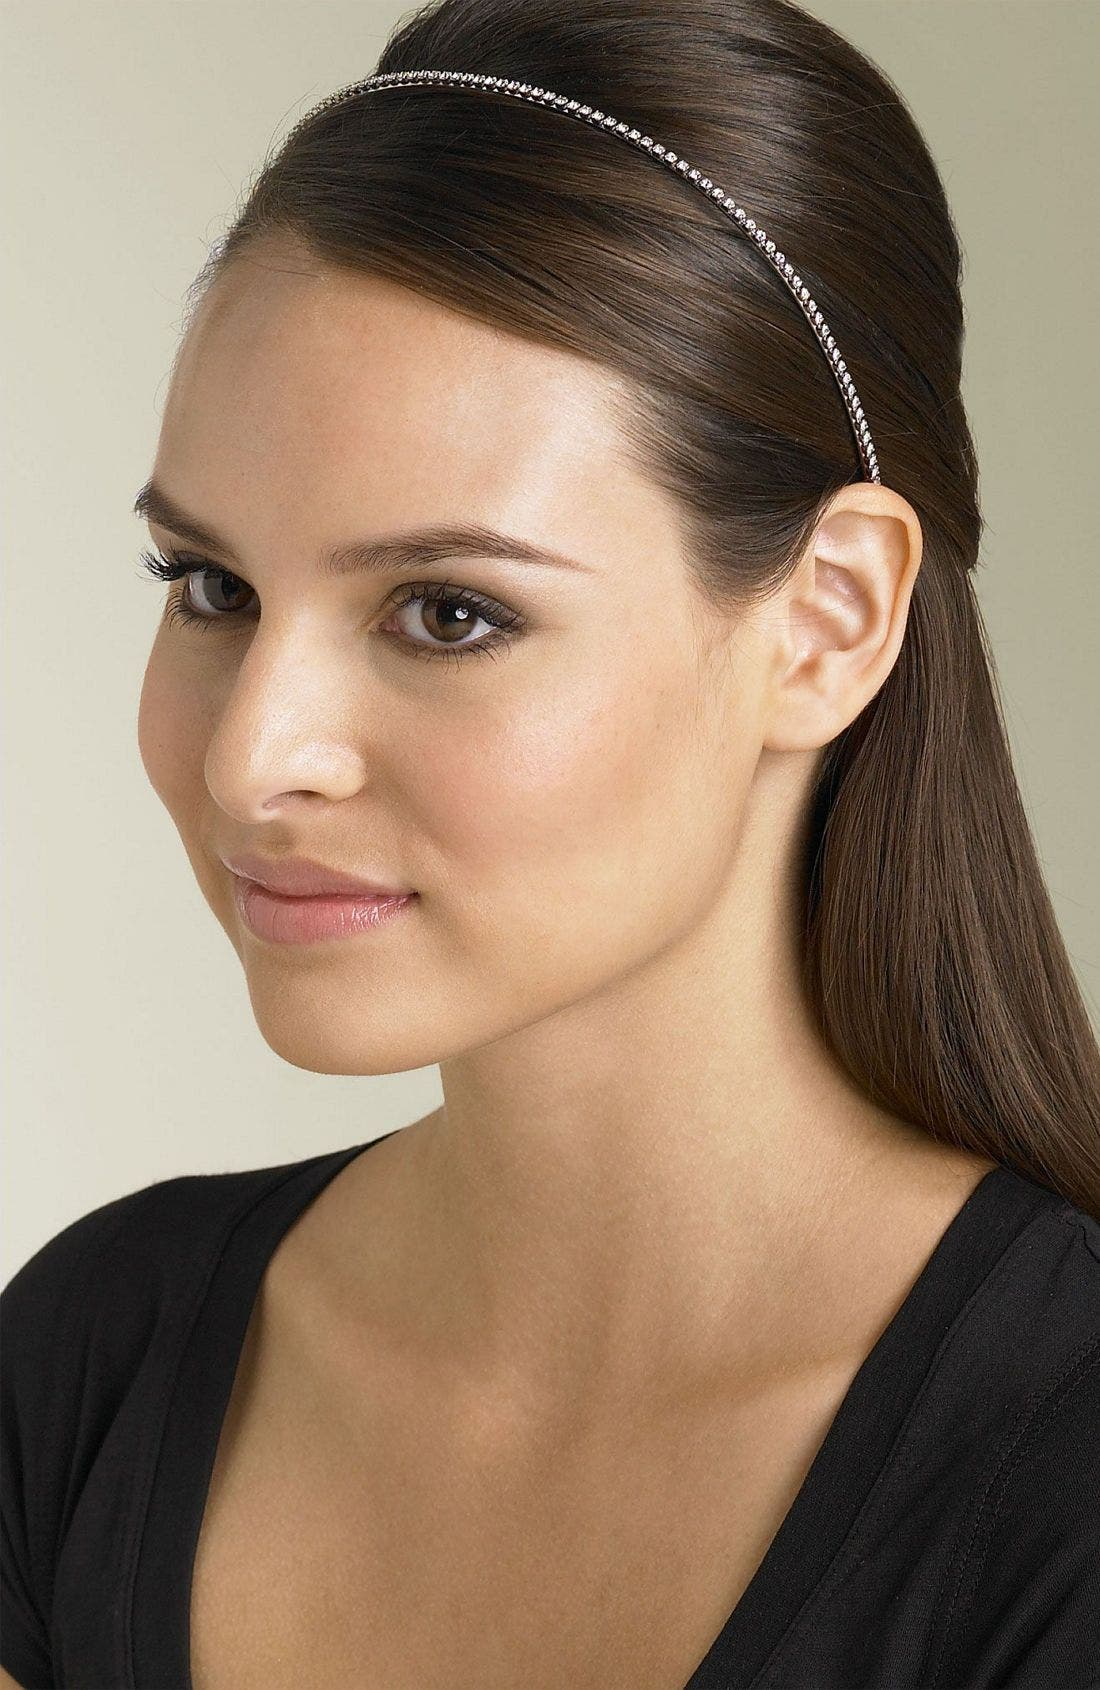 Main Image - Ficcare Swarovski Crystal Chain Headband